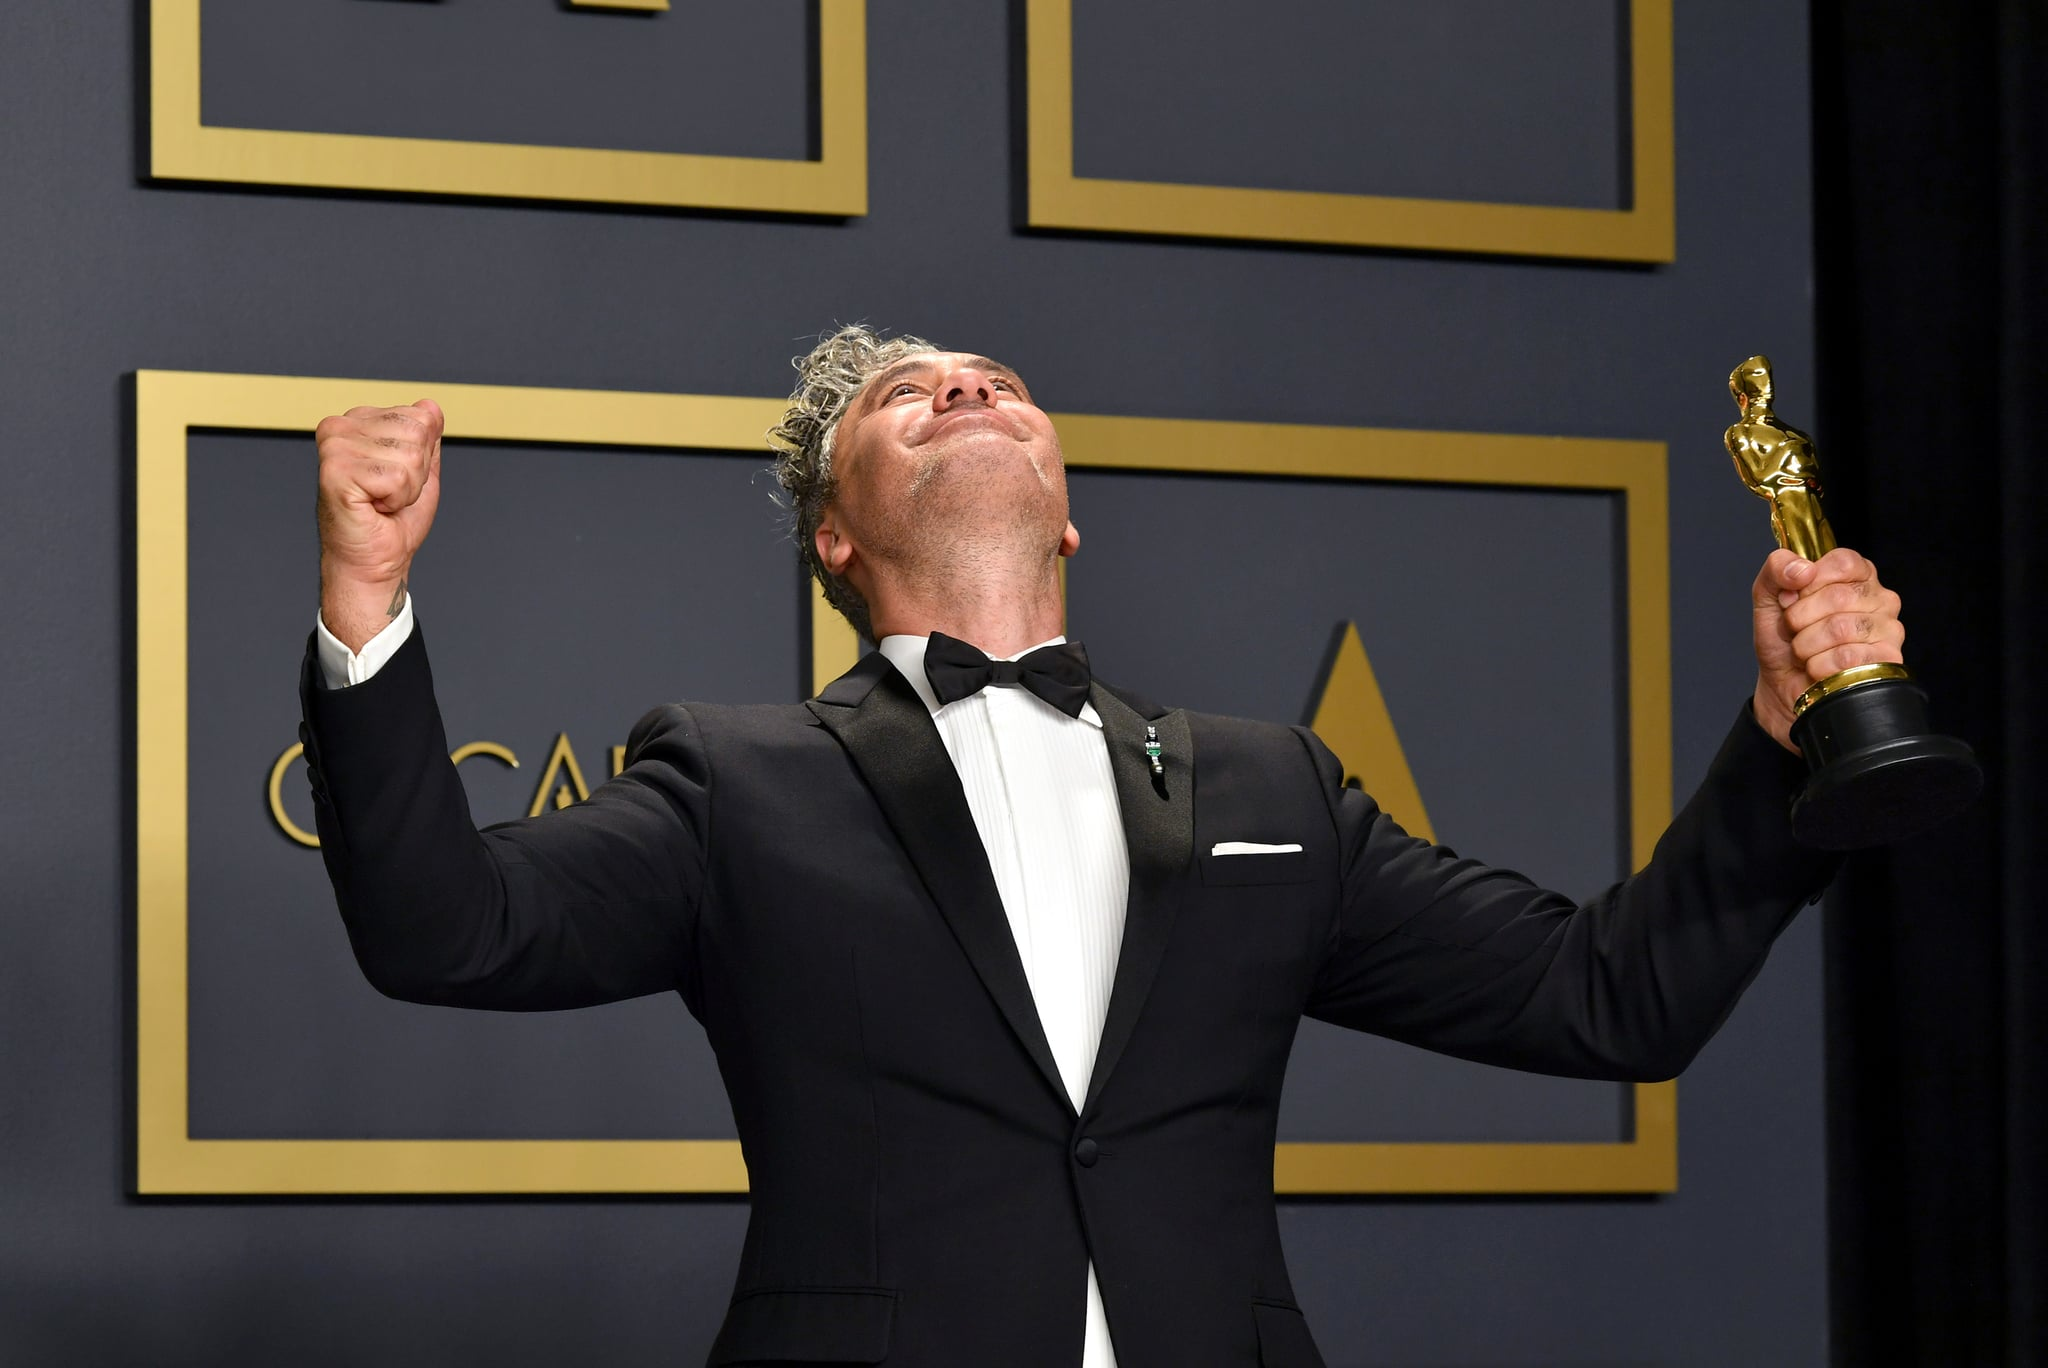 HOLLYWOOD, CALIFORNIA - FEBRUARY 09: Director Taika Waititi, winner of the Adapted Screenplay award for